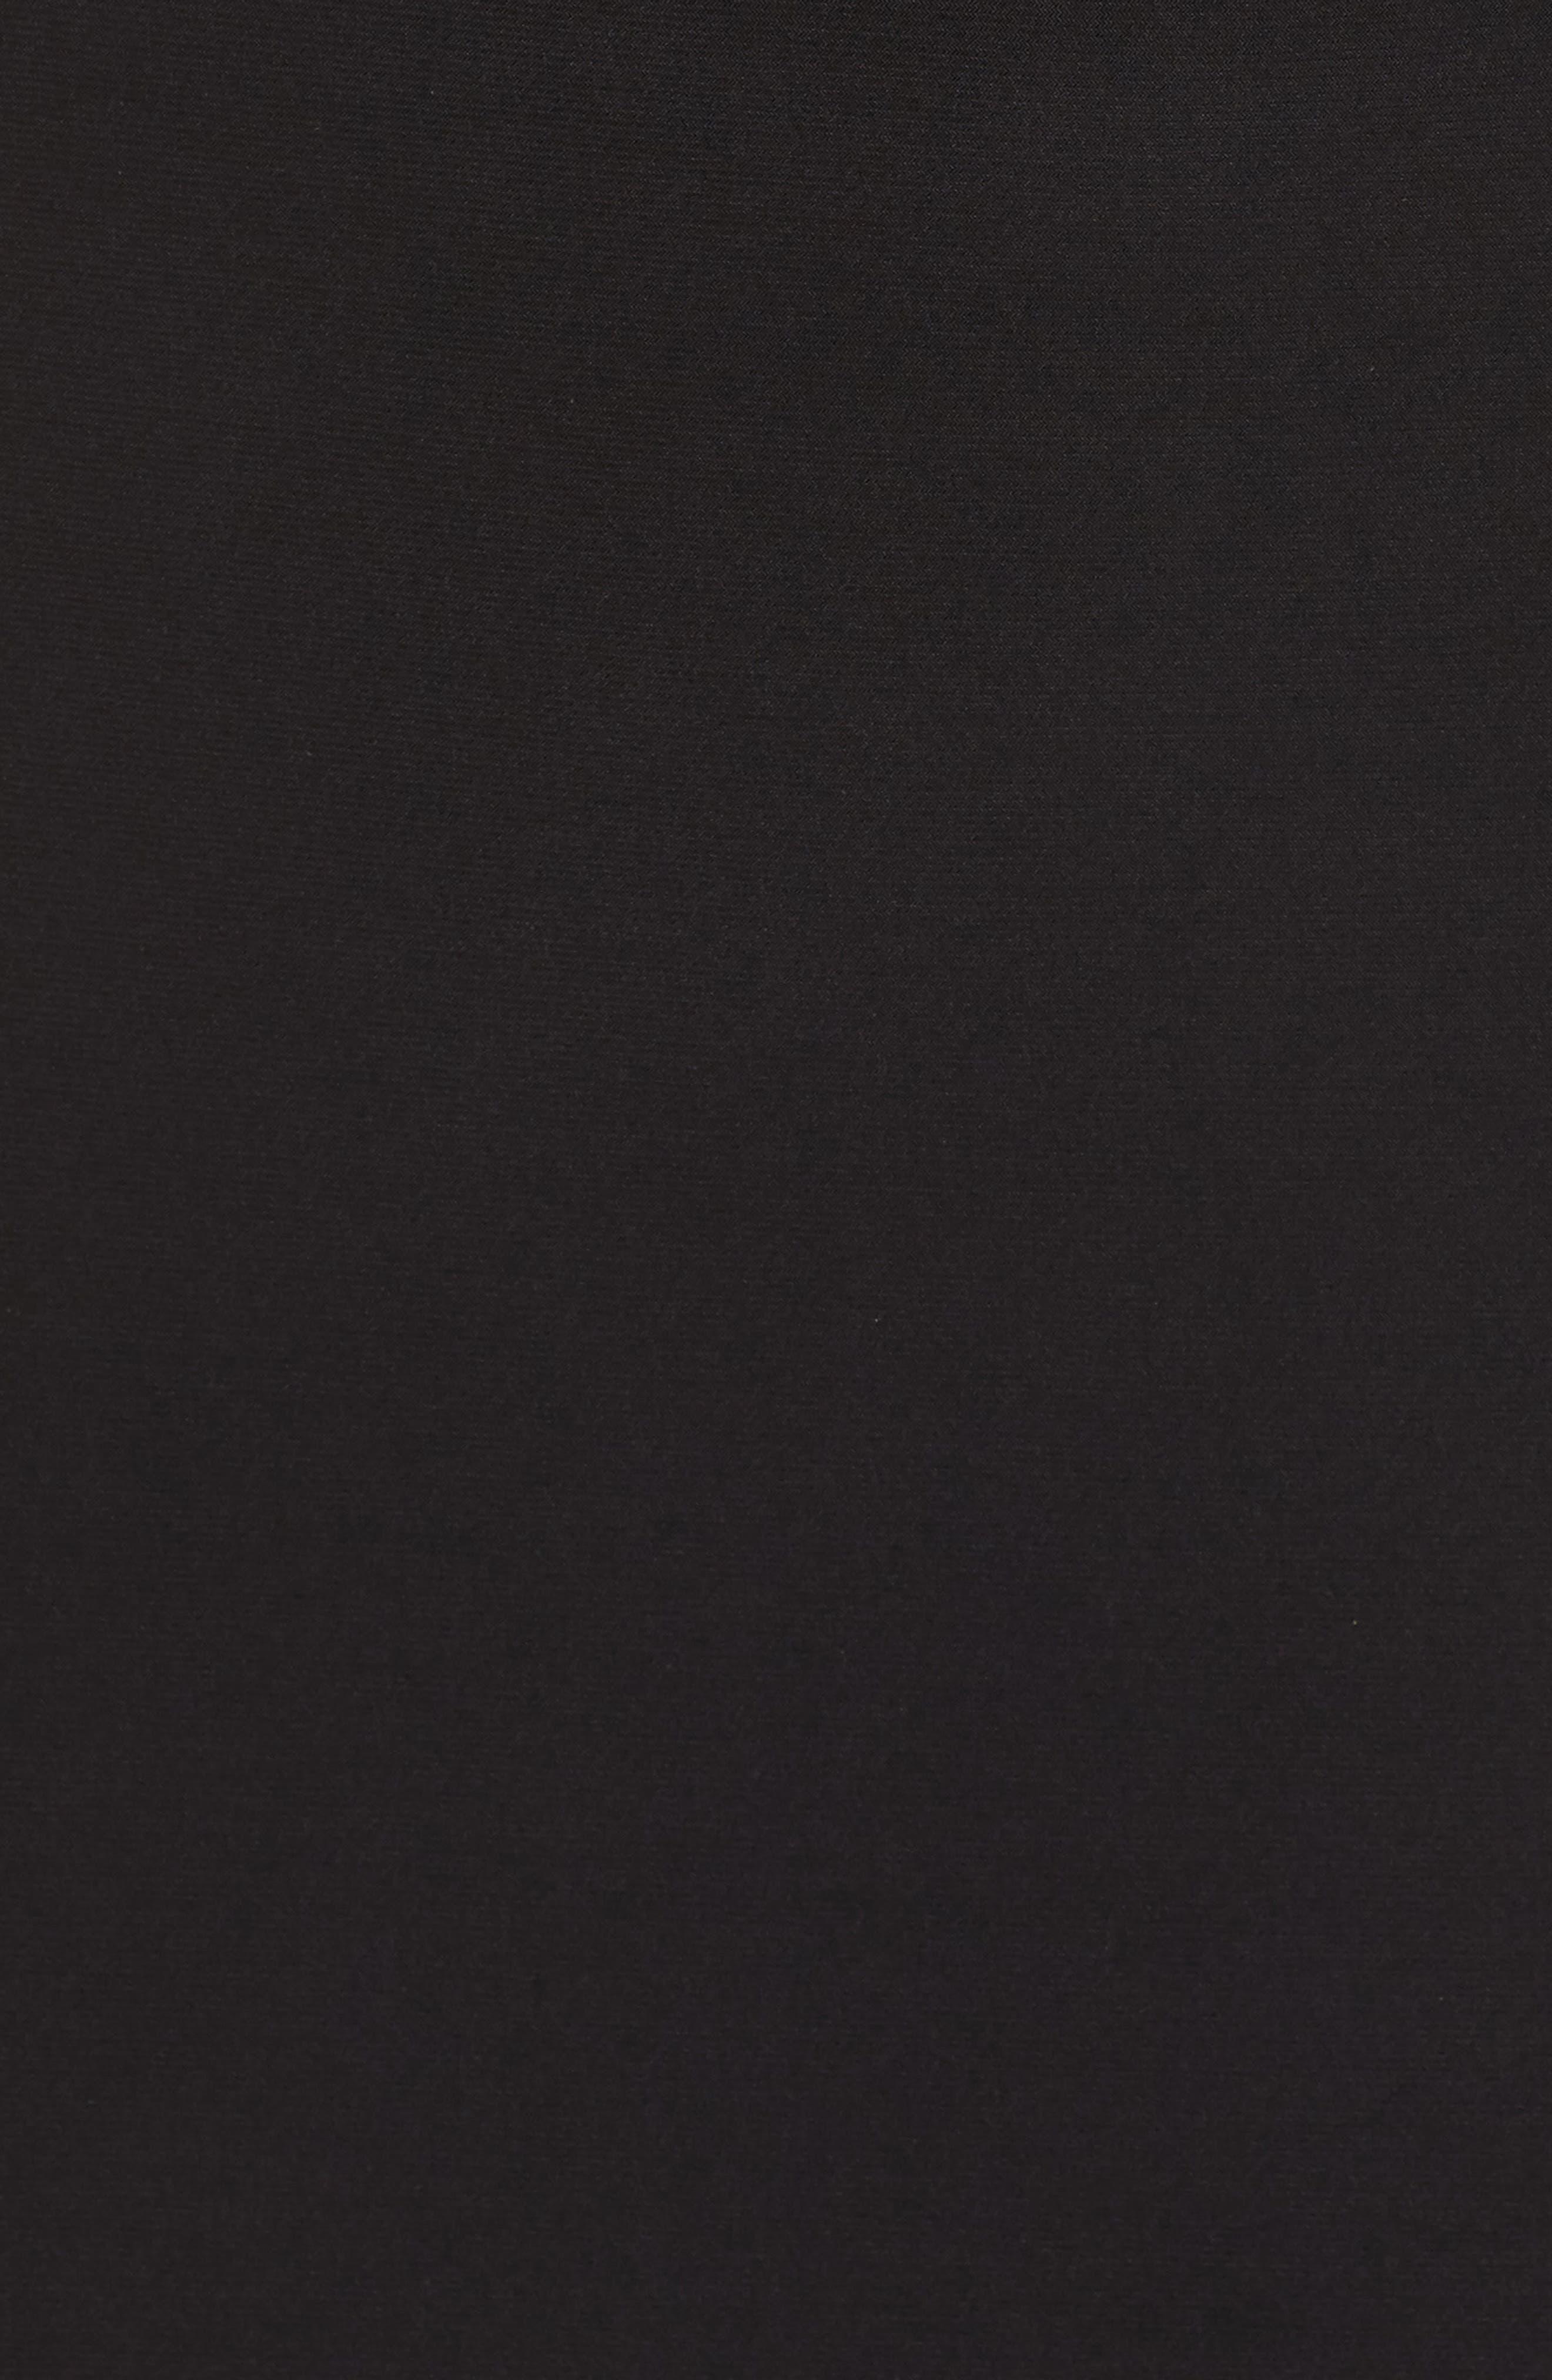 Sequin Halter Gown,                             Alternate thumbnail 5, color,                             BLACK/ NUDE